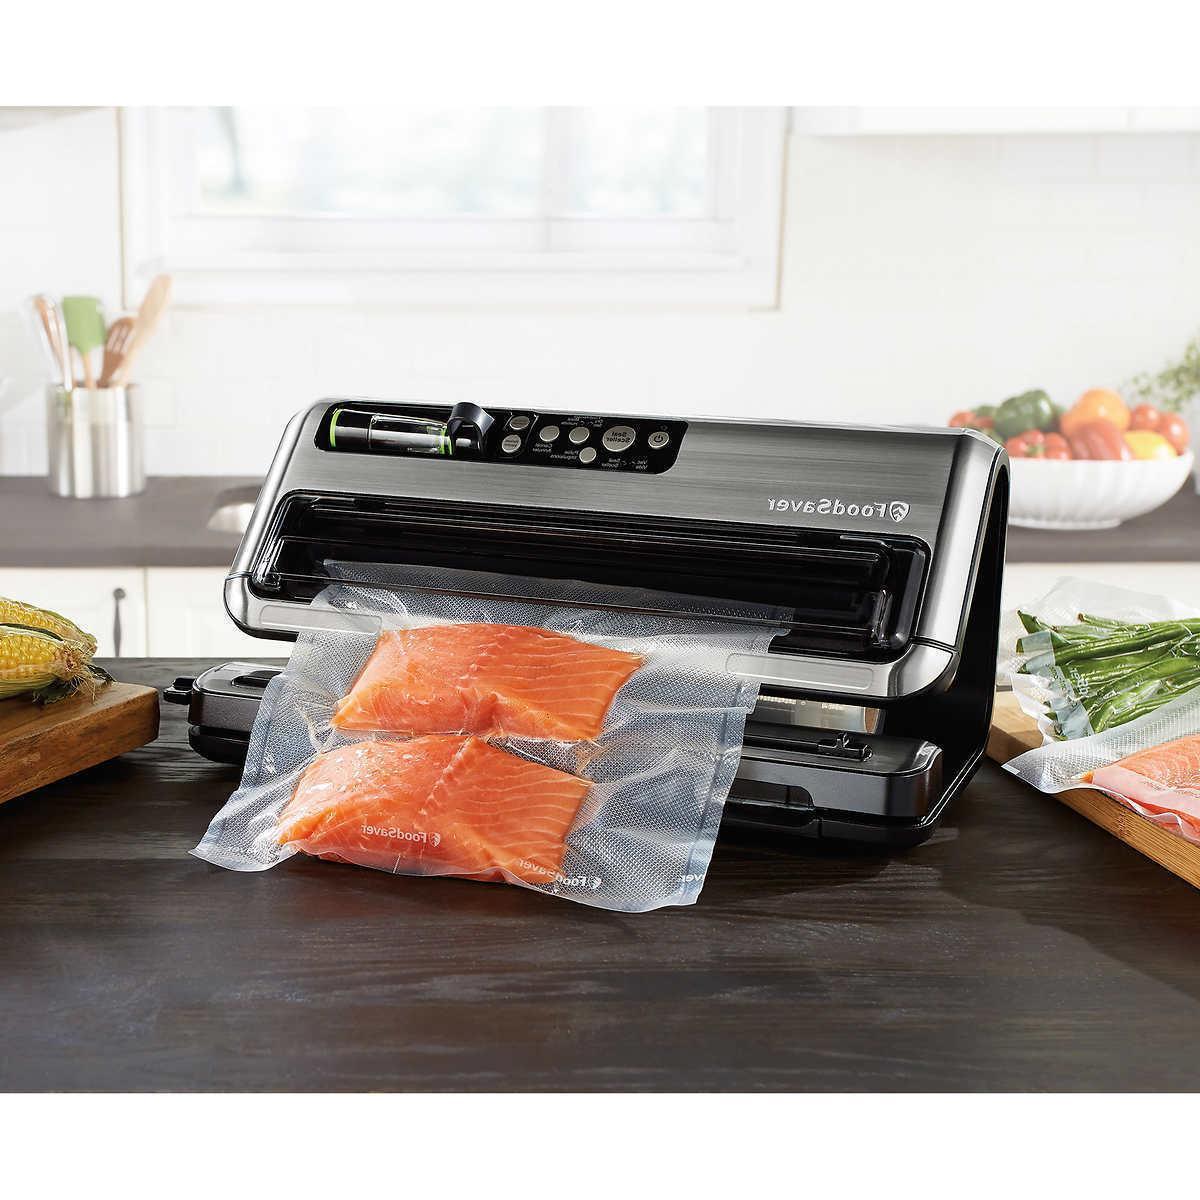 FoodSaver 5400 Series Vacuum Preservation w/ Bag Maker